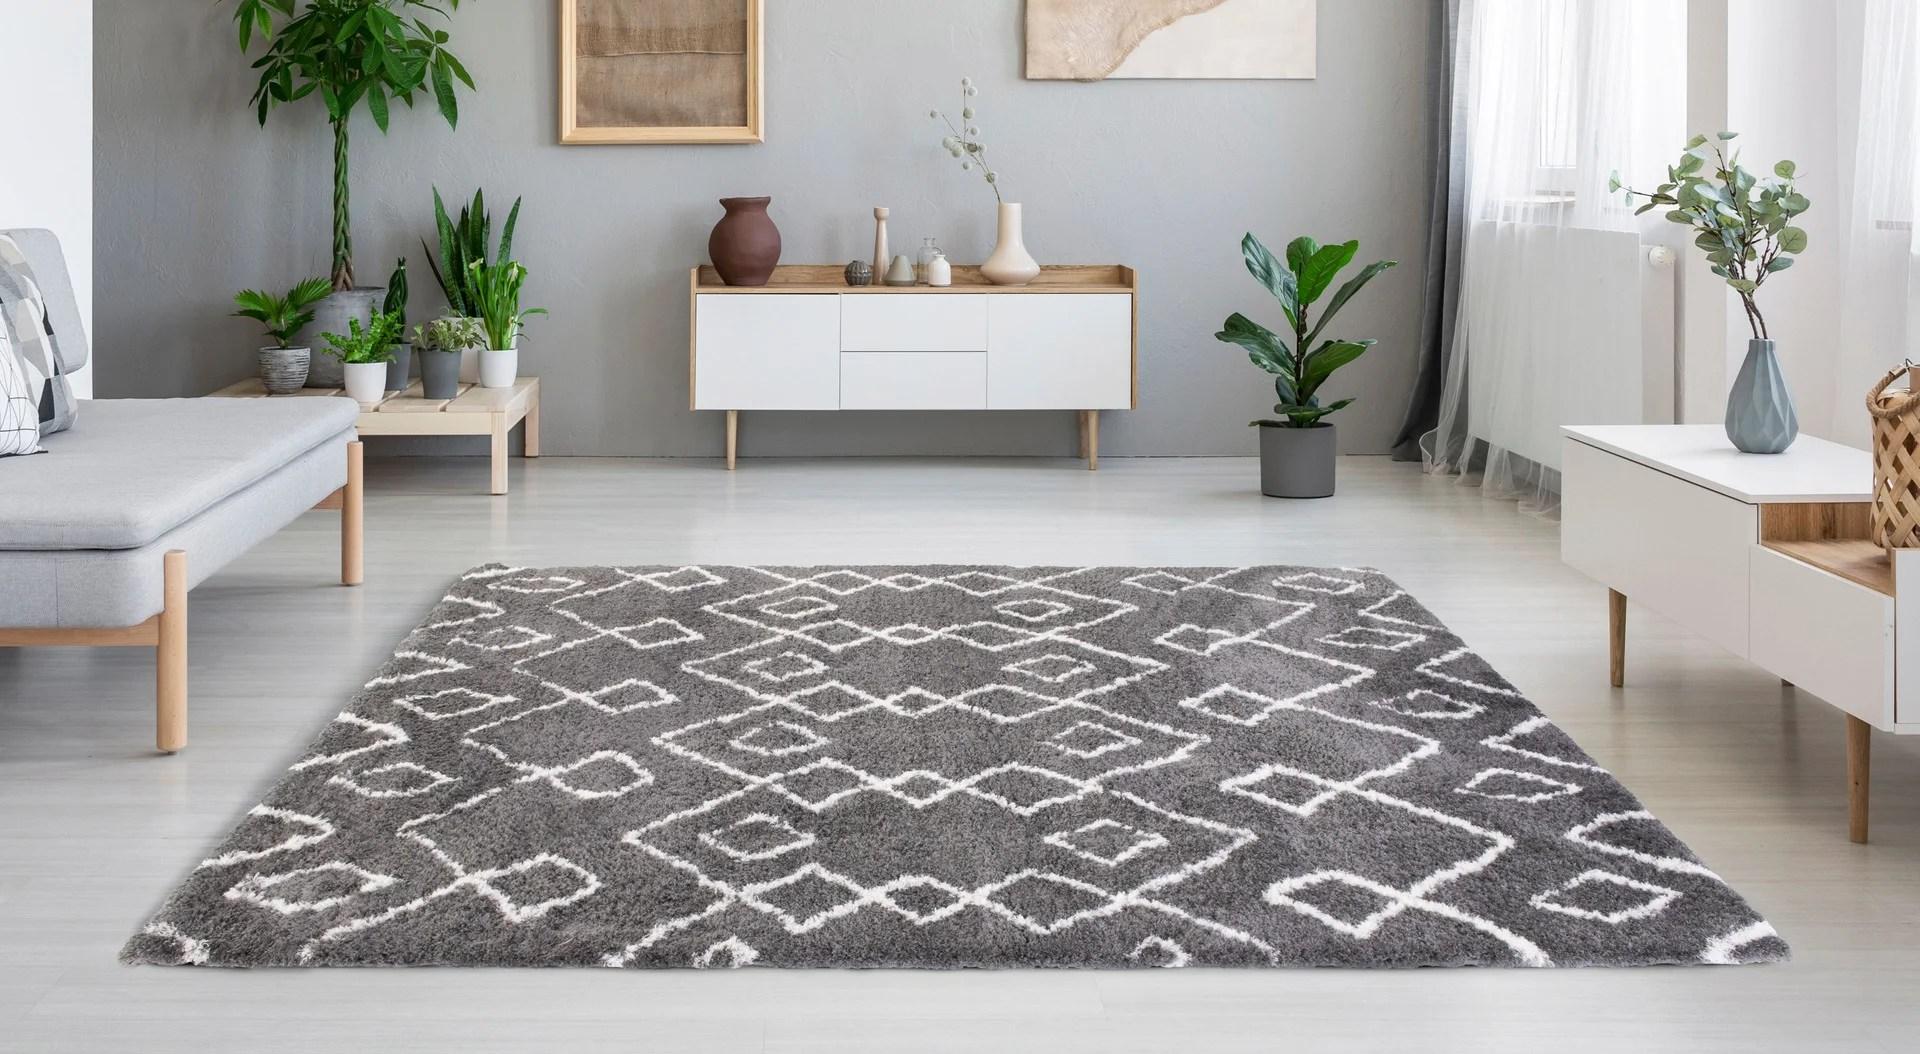 tapis anthracite rectangulaire l 200 x l 290 cm softy